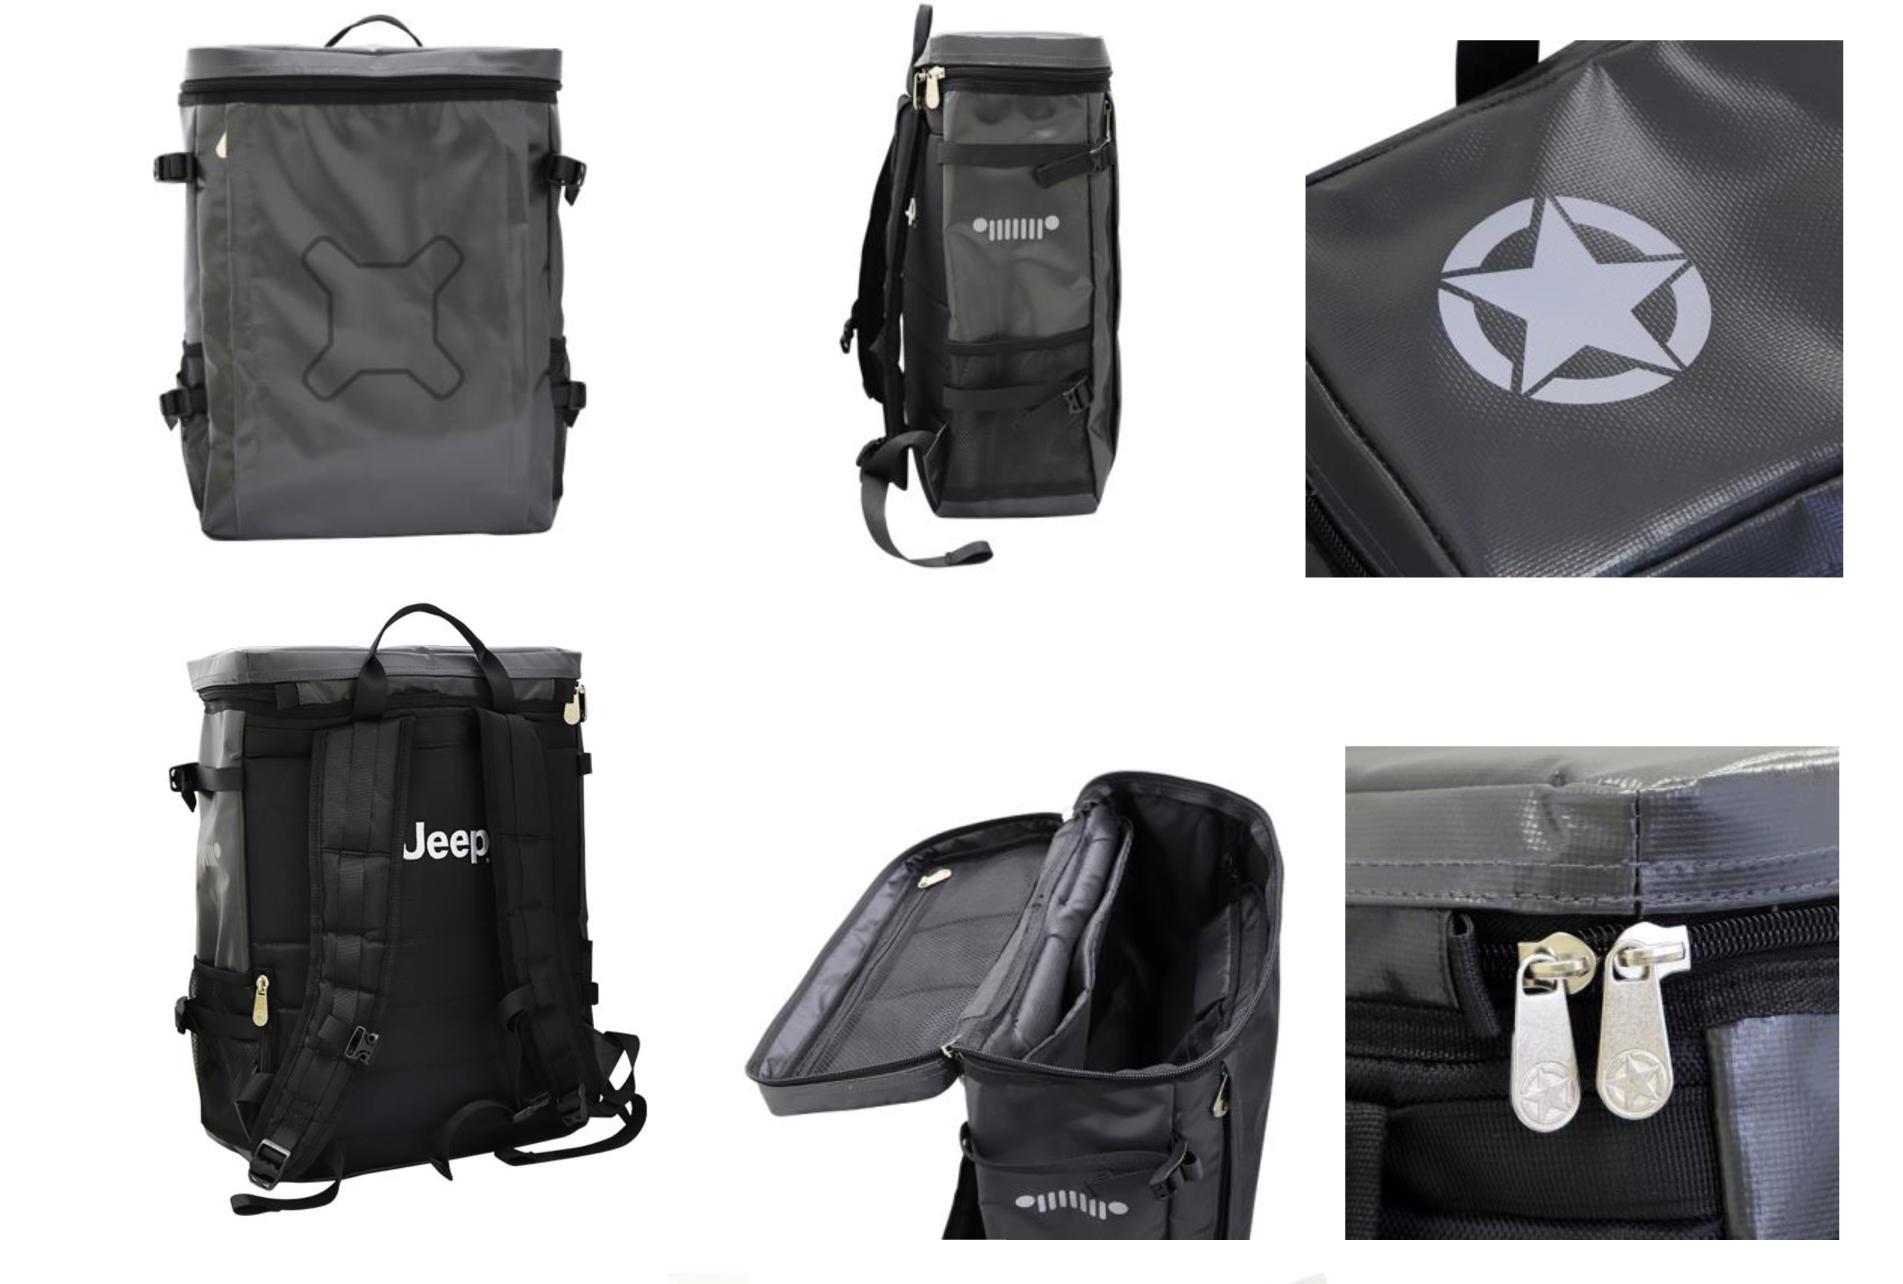 CS019-19_MD Jerrycan bag 発売のご案内-2.jpg